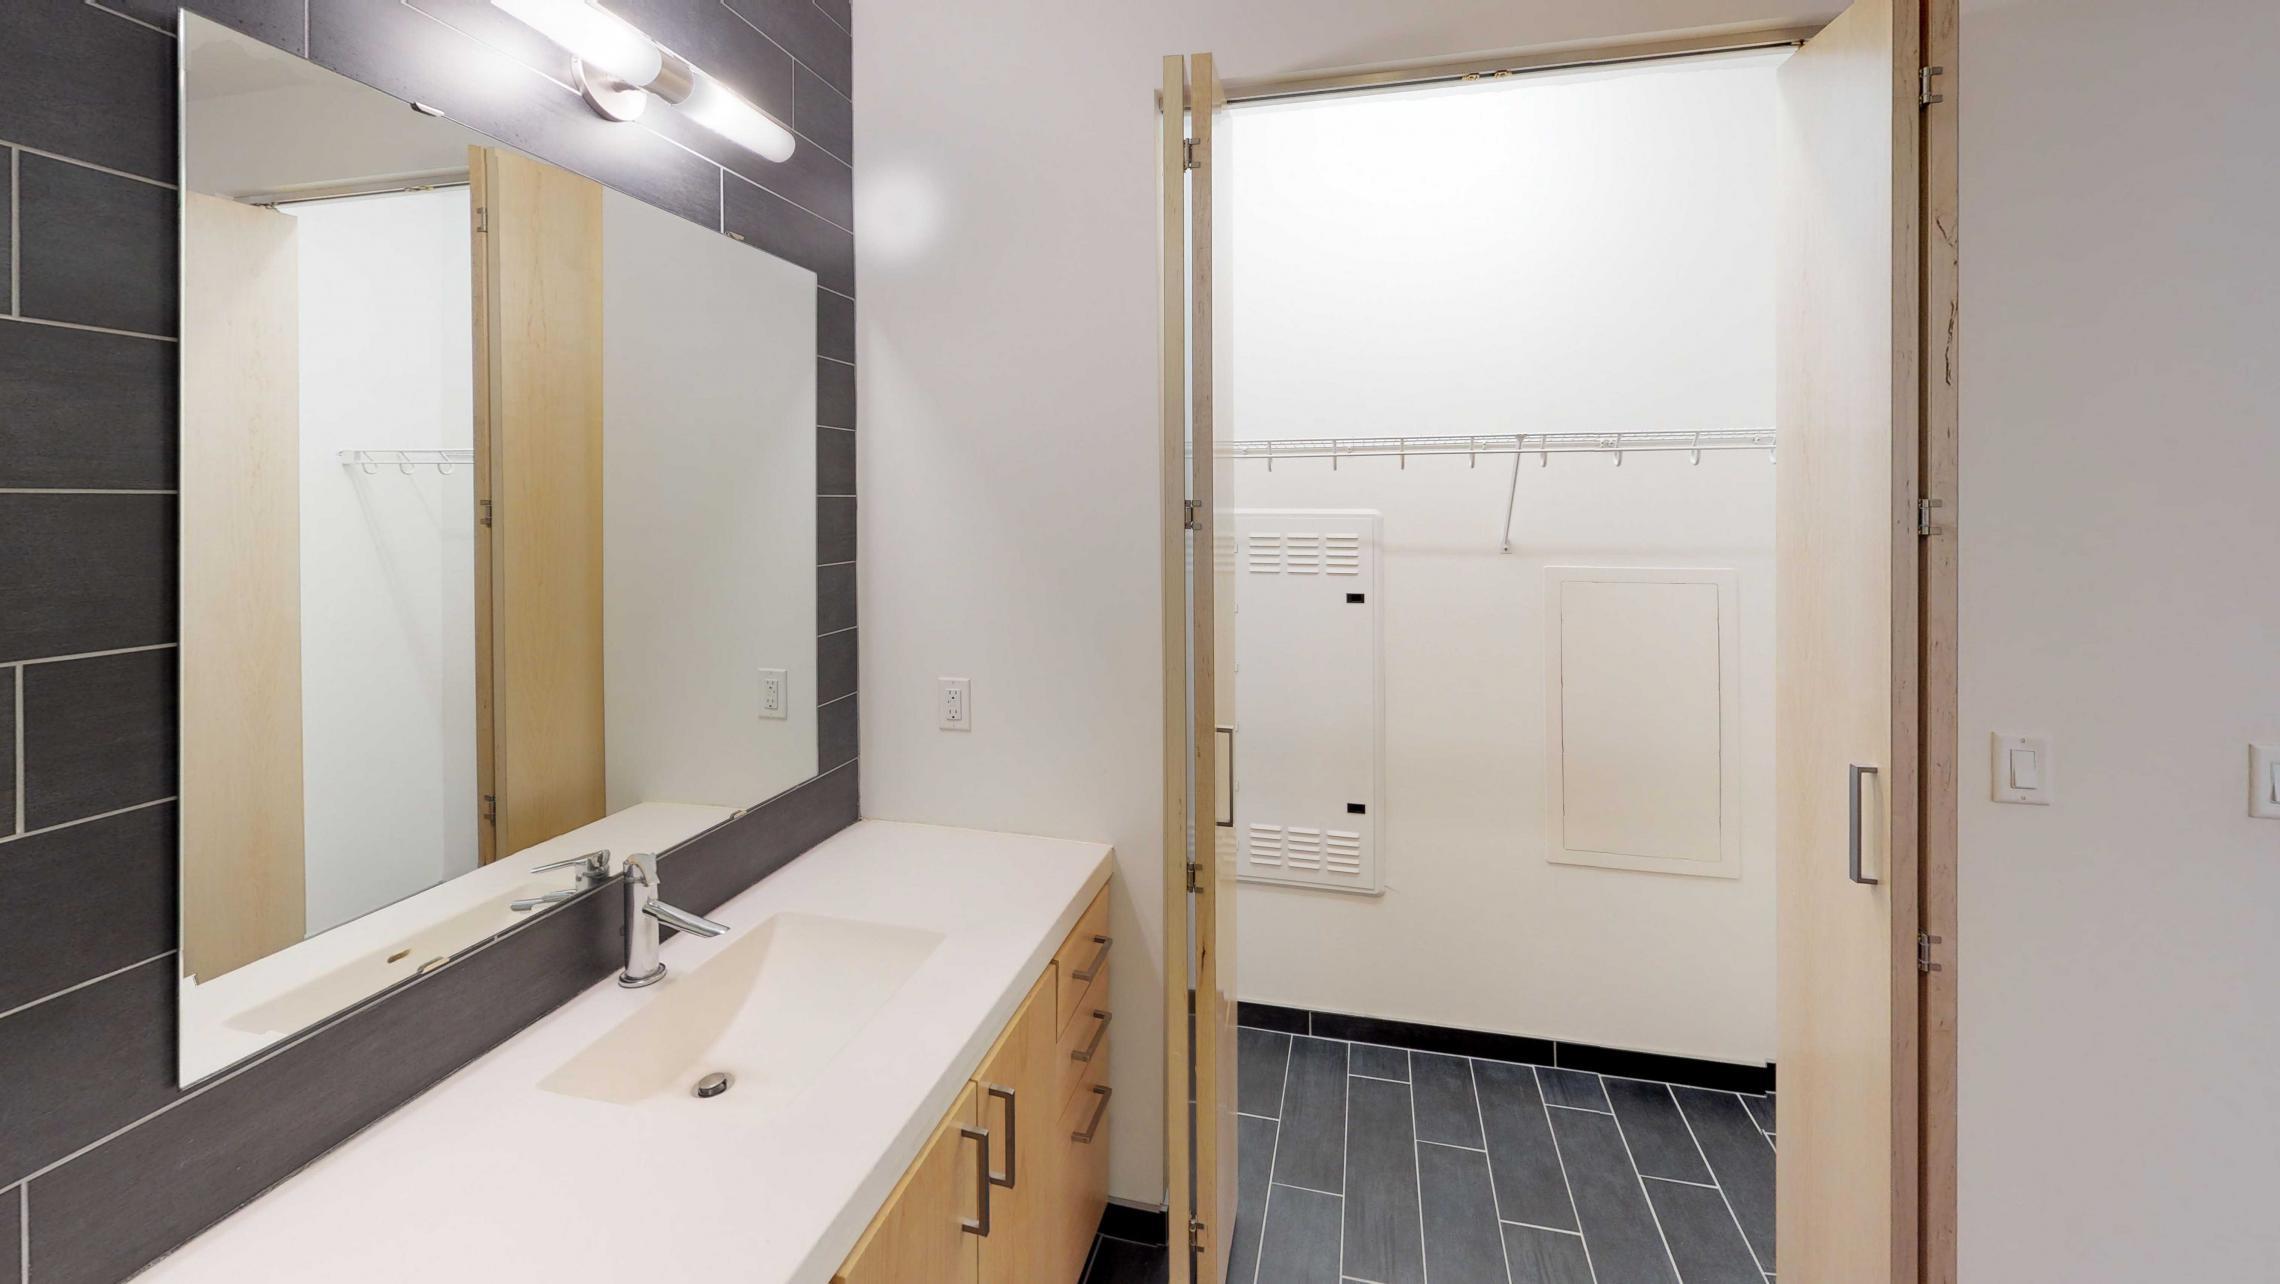 SEVEN27-Apartment-115-studio-lake view-modern-upscale-downtown-madison-patio-courtyard-bathroom-closet-storage.jpg